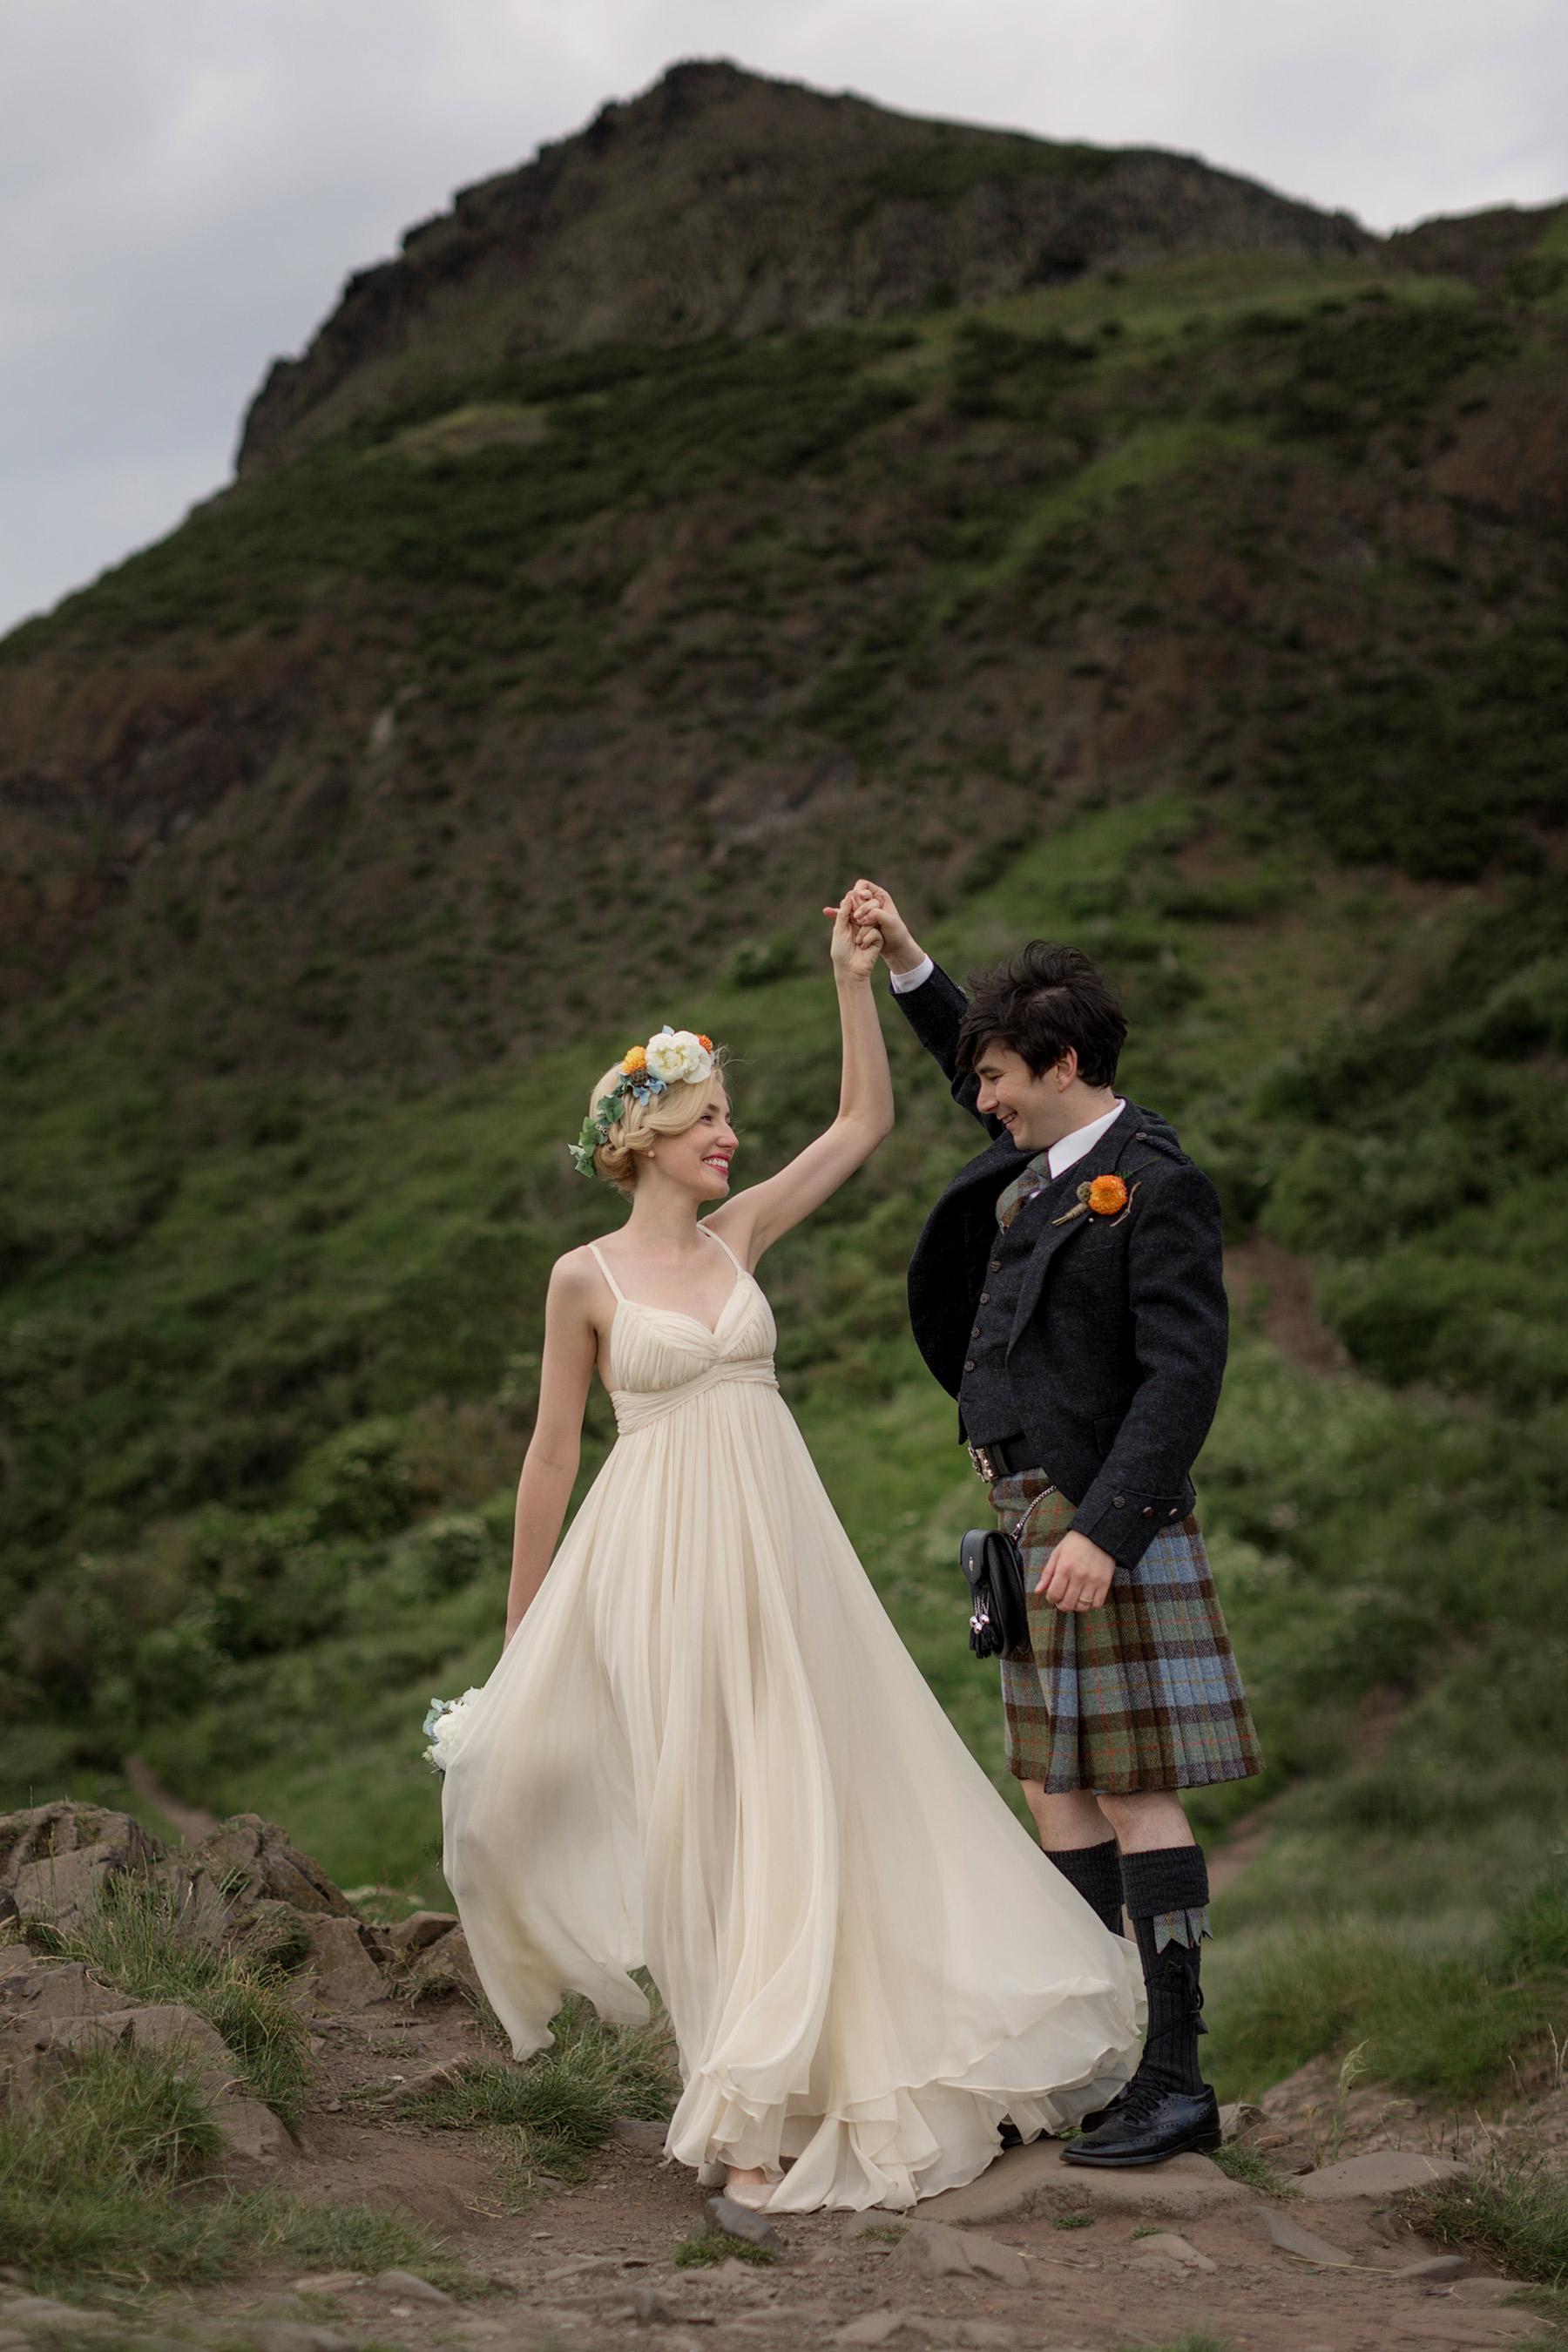 stuart mcleod and Jenni melear wedding in scotland